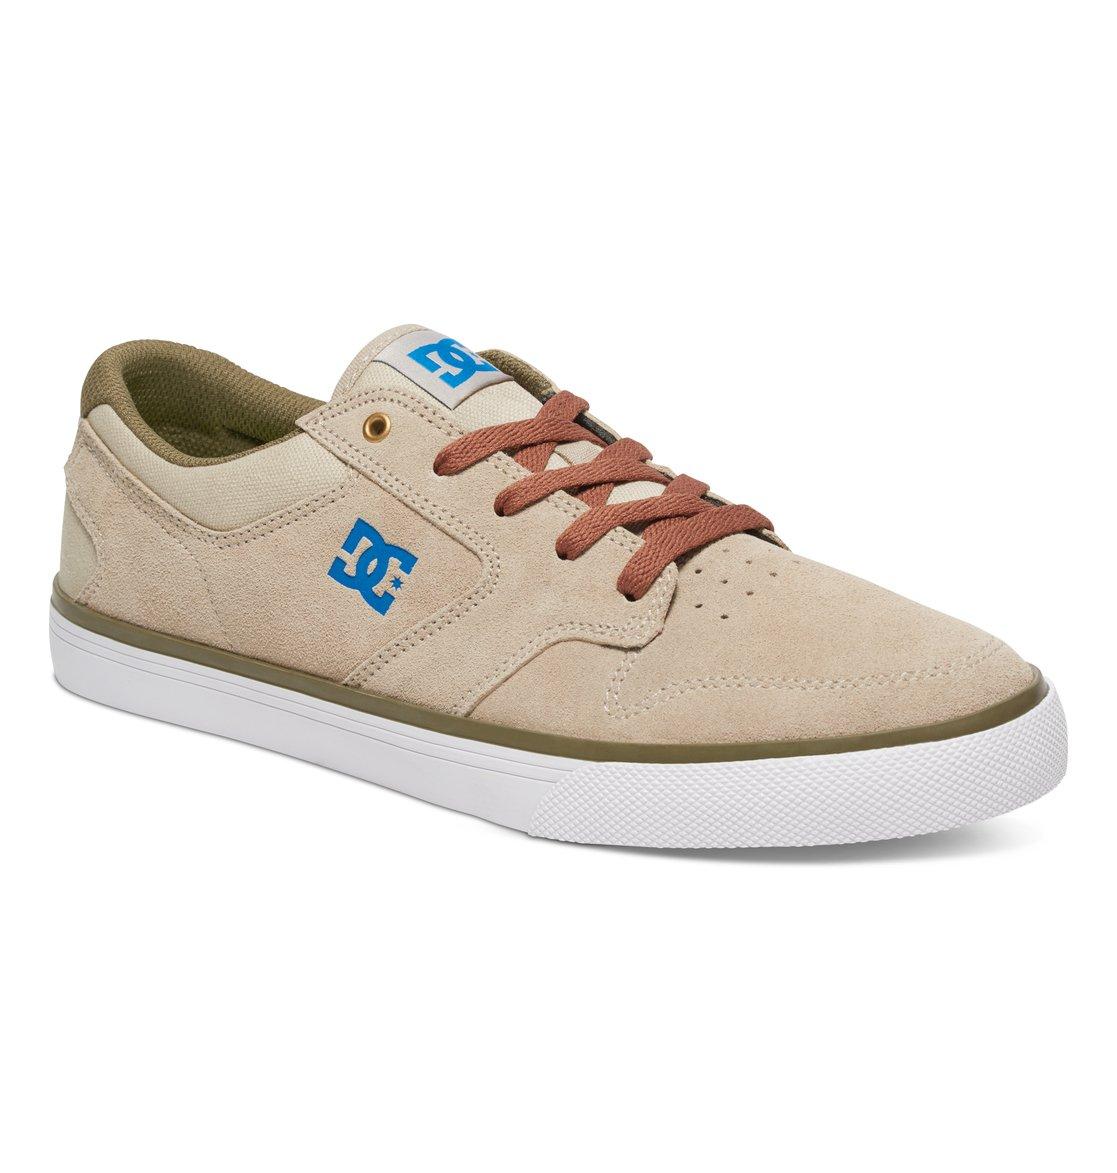 Argosy Vulc Dc Shoes